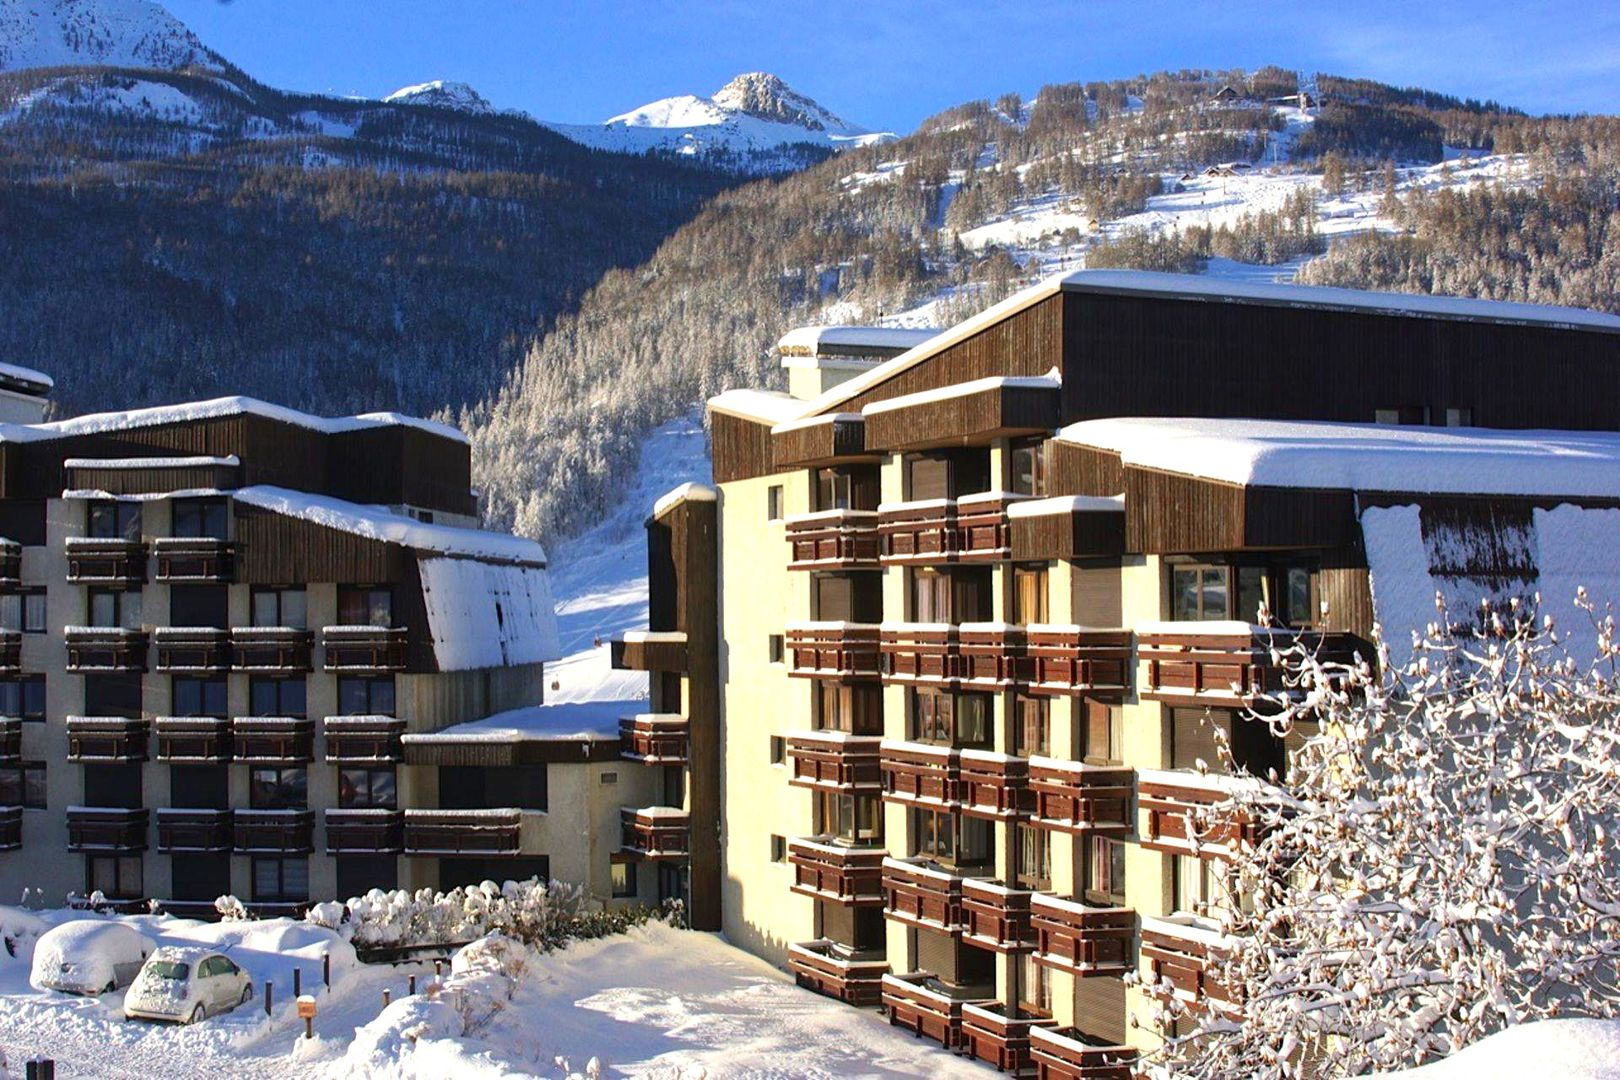 hotel mondi holiday alpenblickhotel oberstaufen